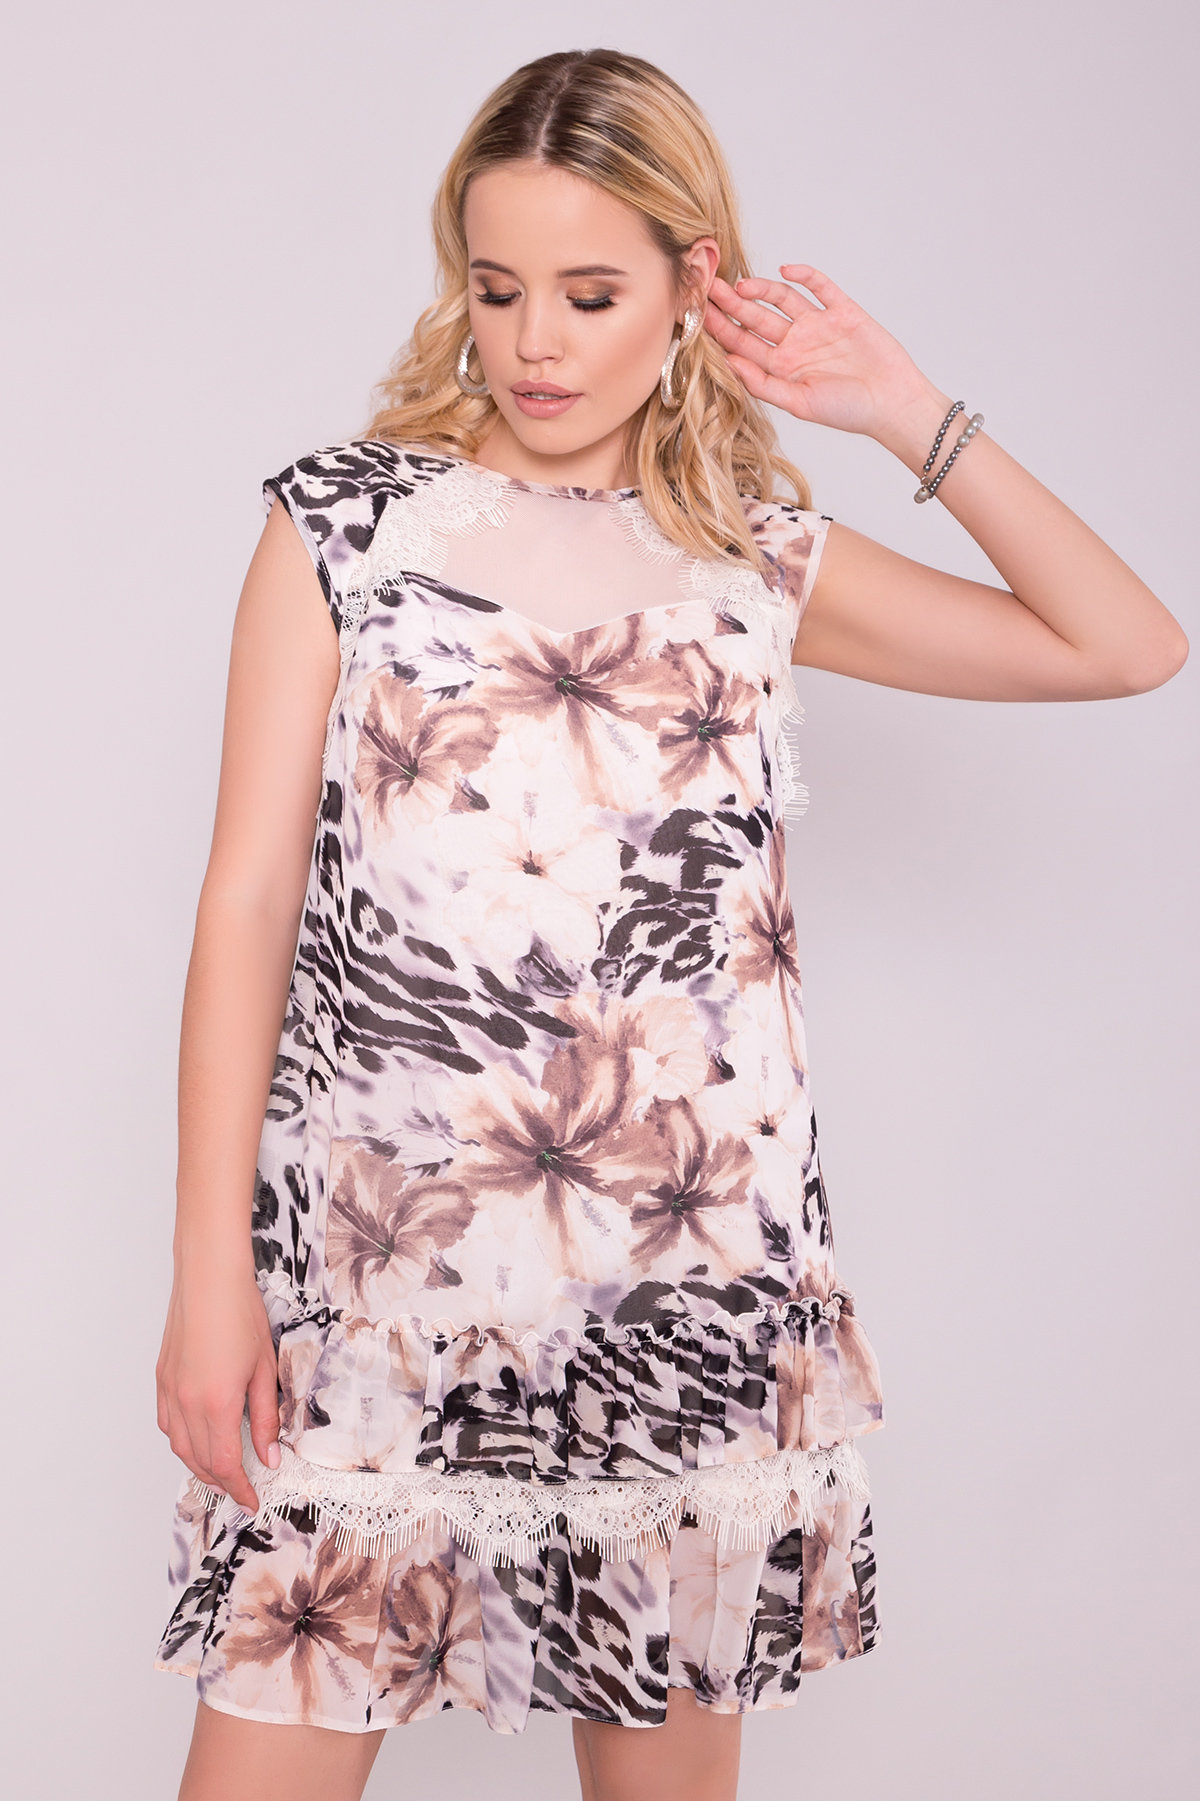 Платье Нектар 6916 АРТ. 42957 Цвет: Леопард цветы молоко/беж - фото 3, интернет магазин tm-modus.ru